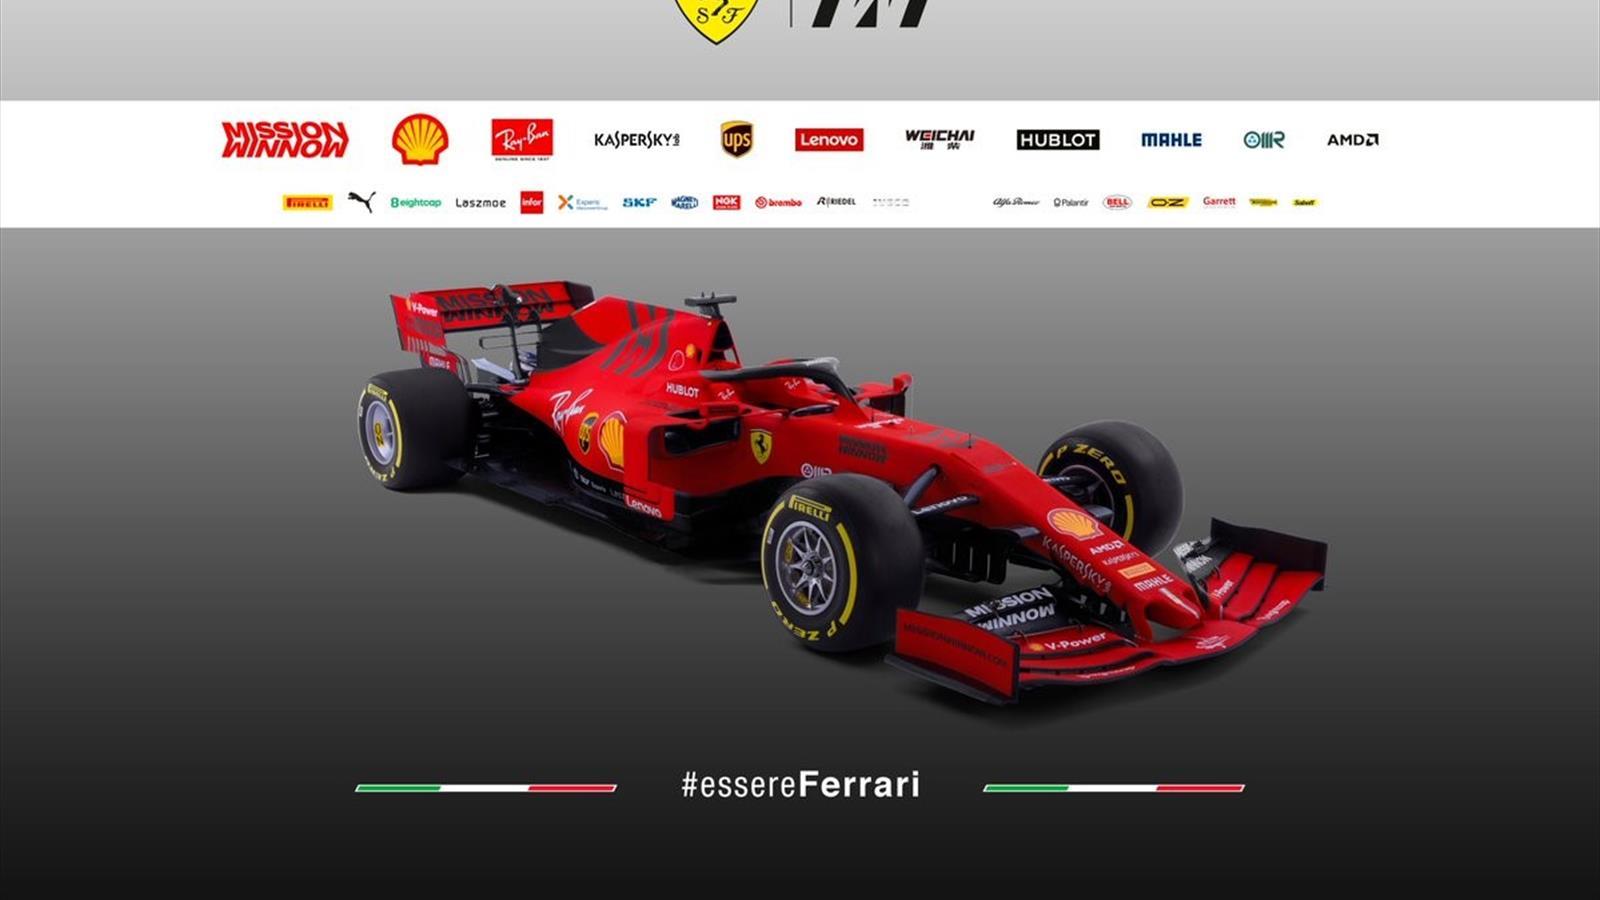 f1 news - ferrari unveil new formula one car for new era - season 2019 - formula 1